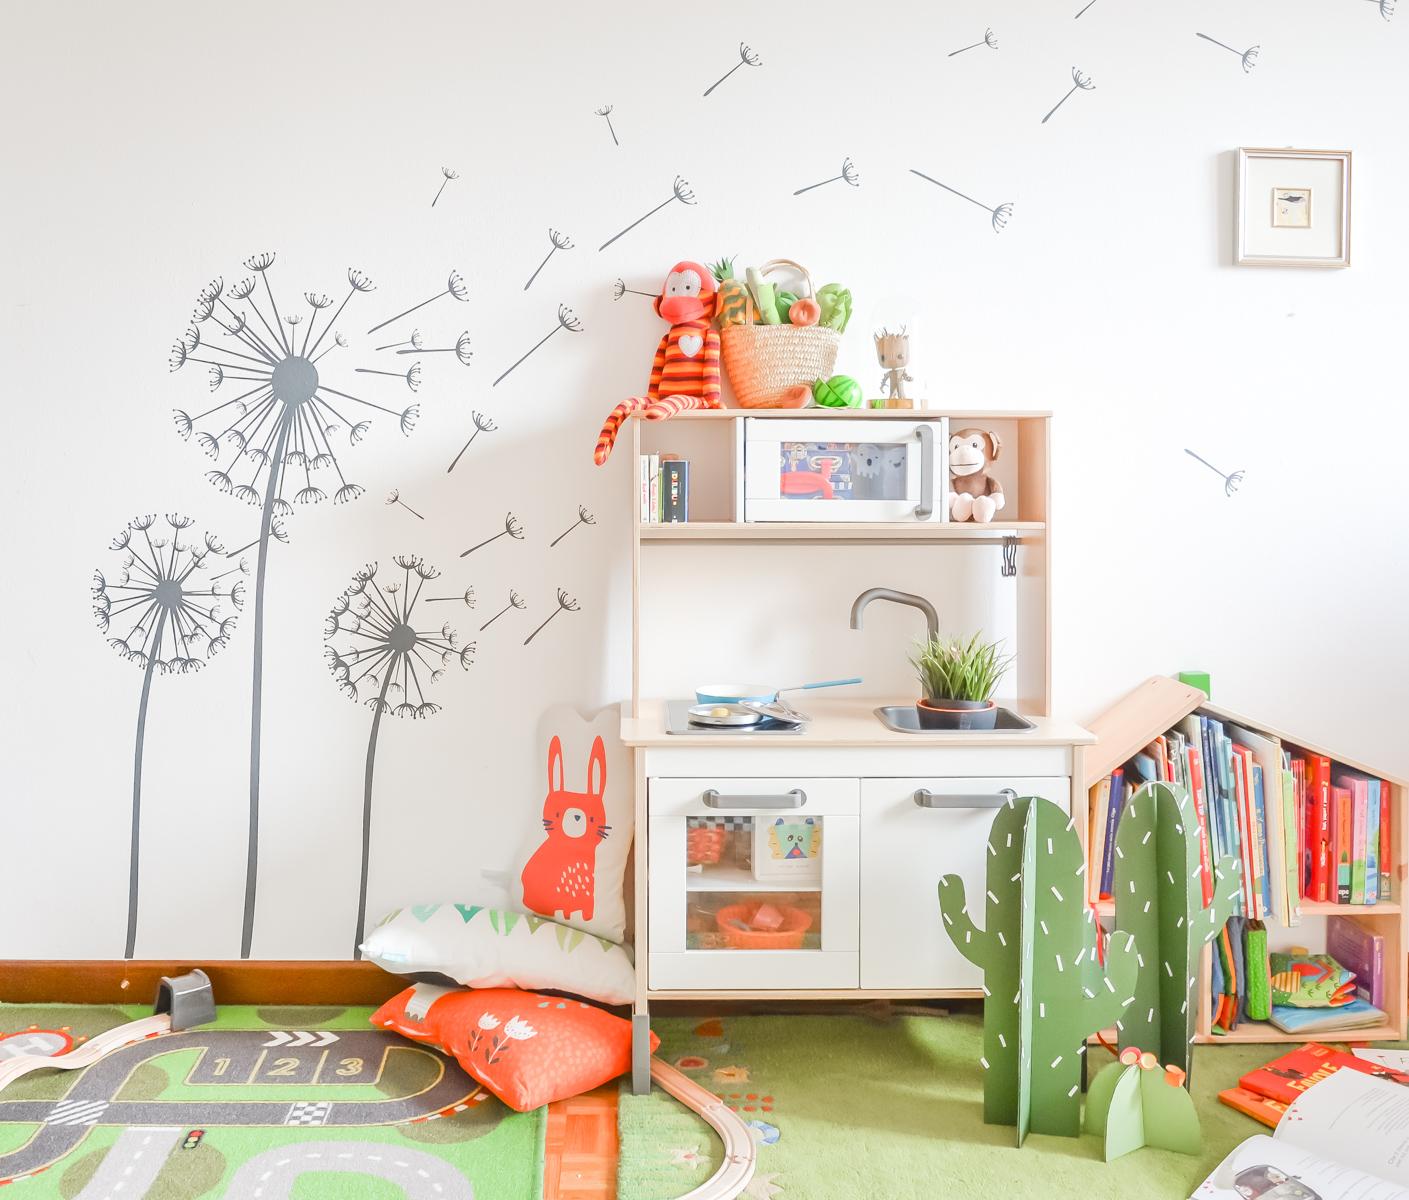 Muri Camerette Per Bambini una cameretta per due da decorare